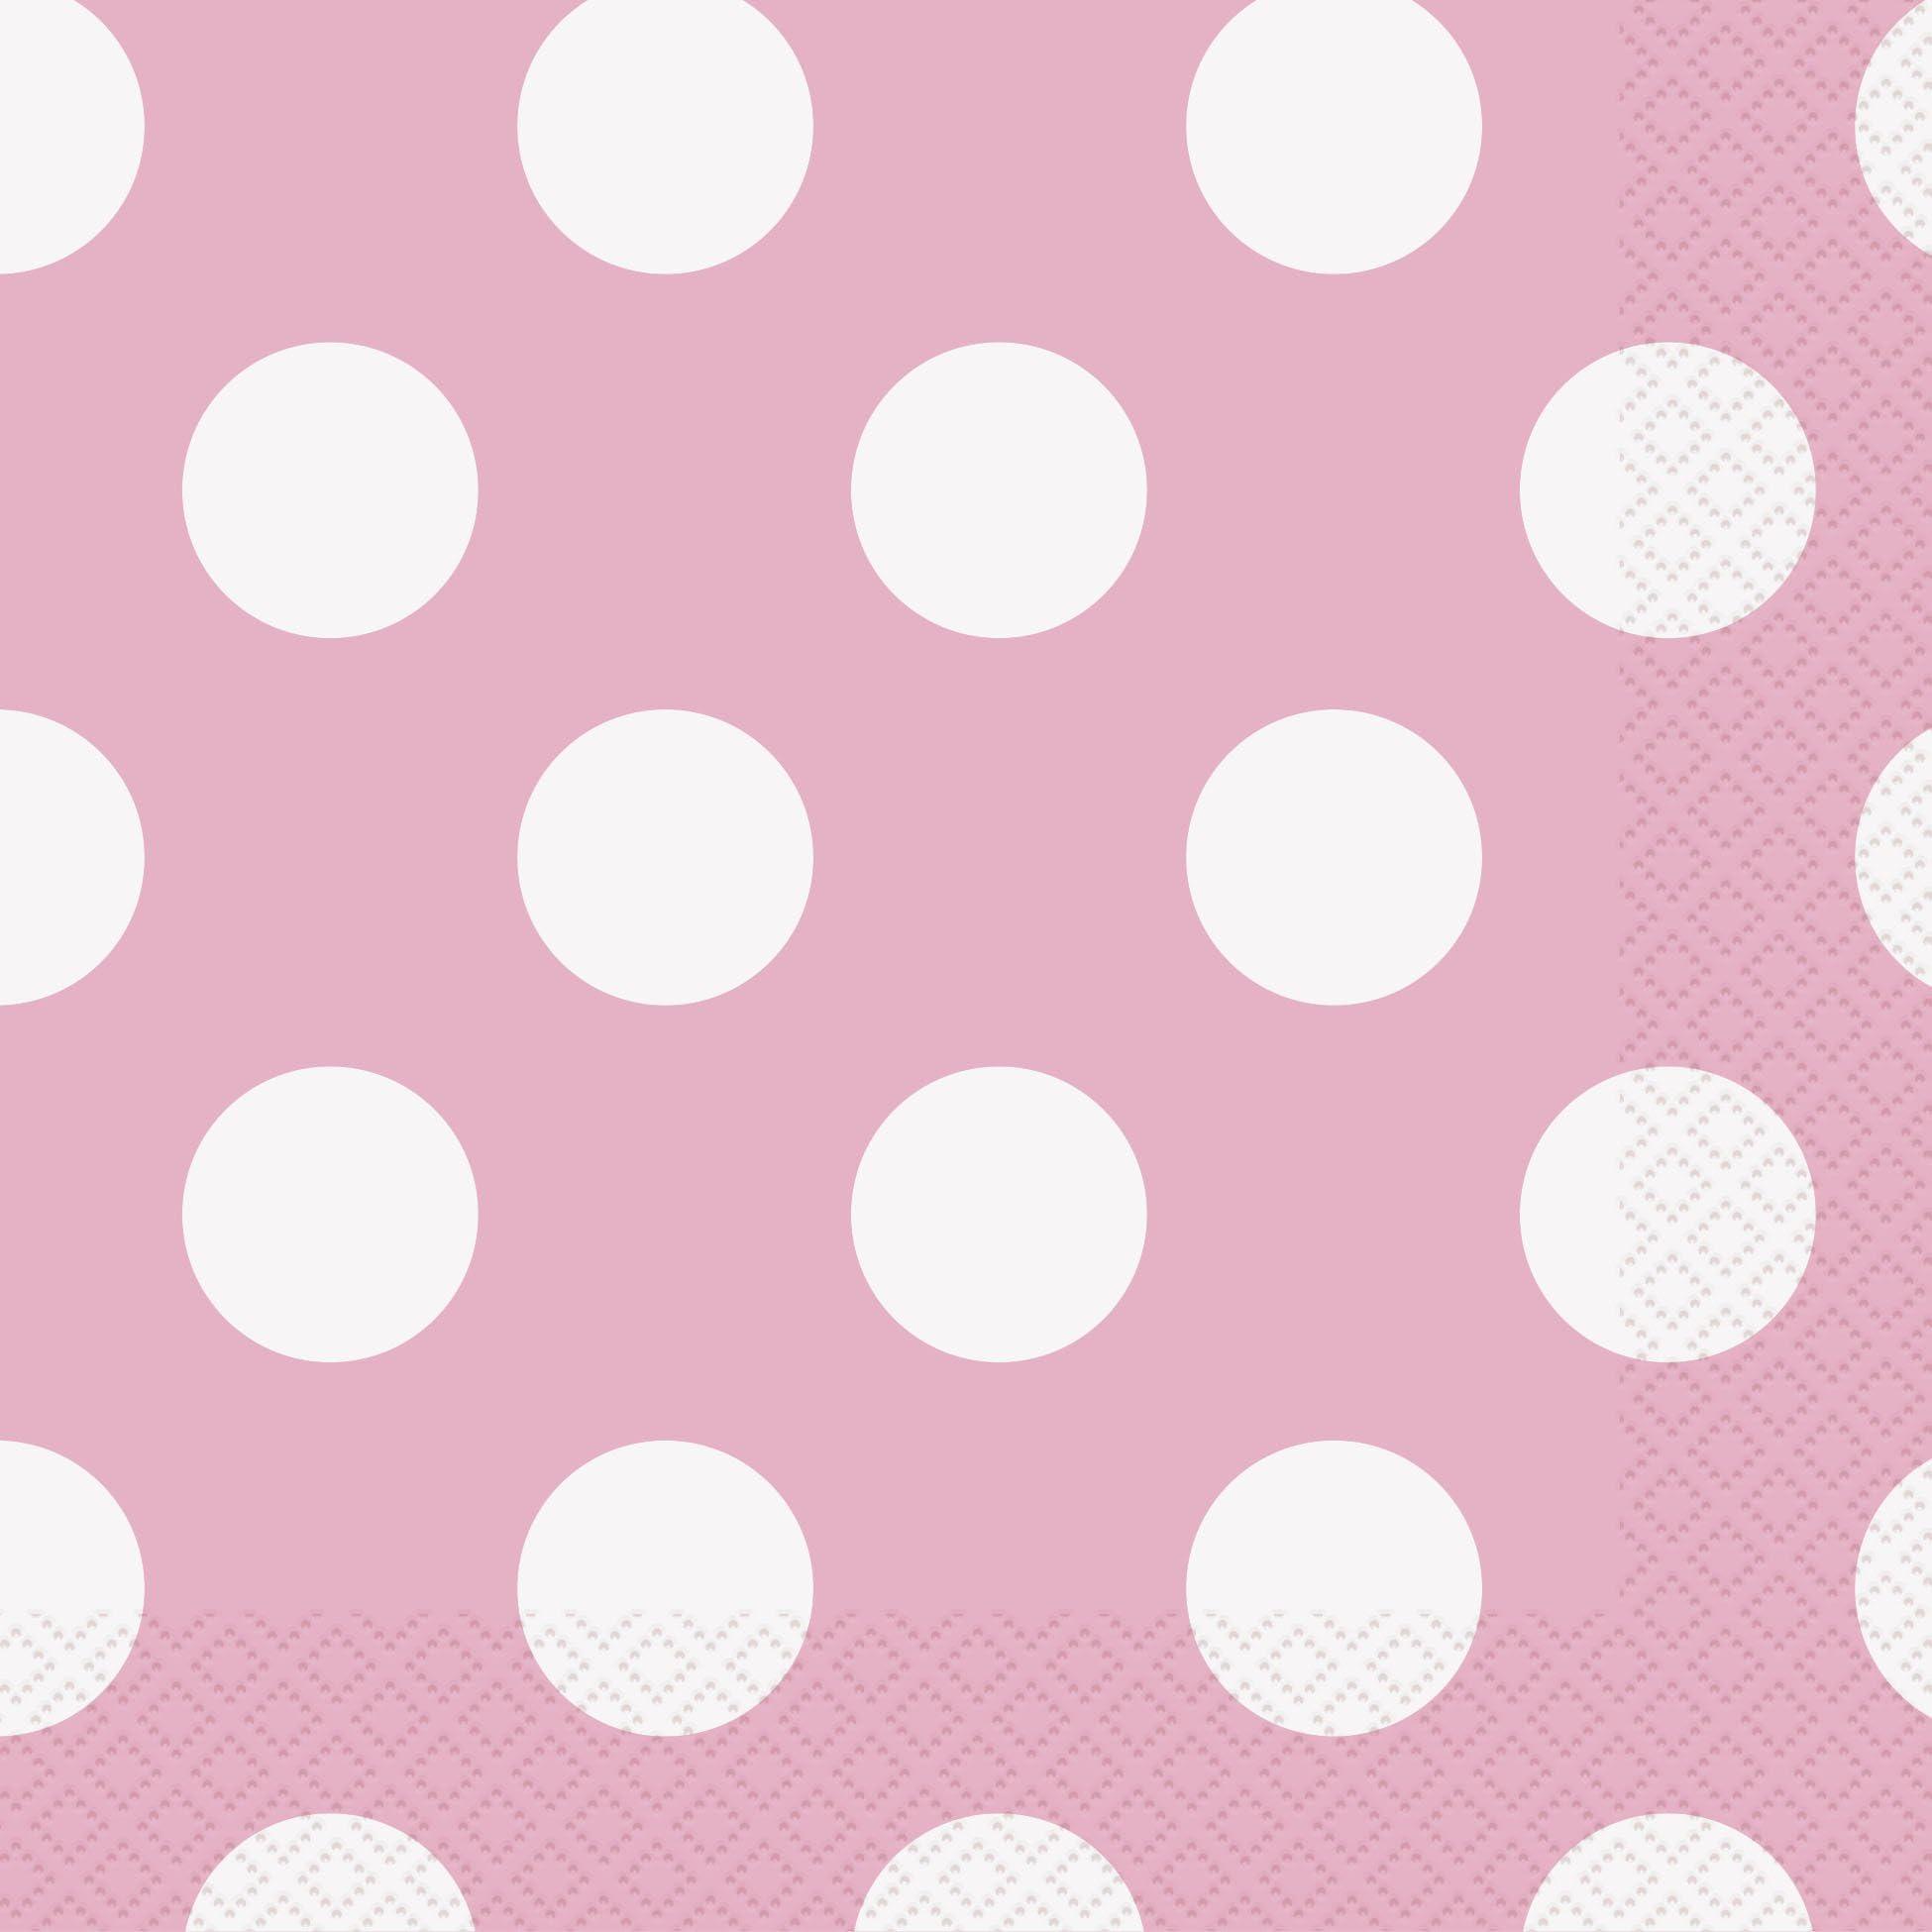 Set of 20 Colorful Polka Dot Party Napkins from Slant Collections Polka Dot Cocktail Napkins